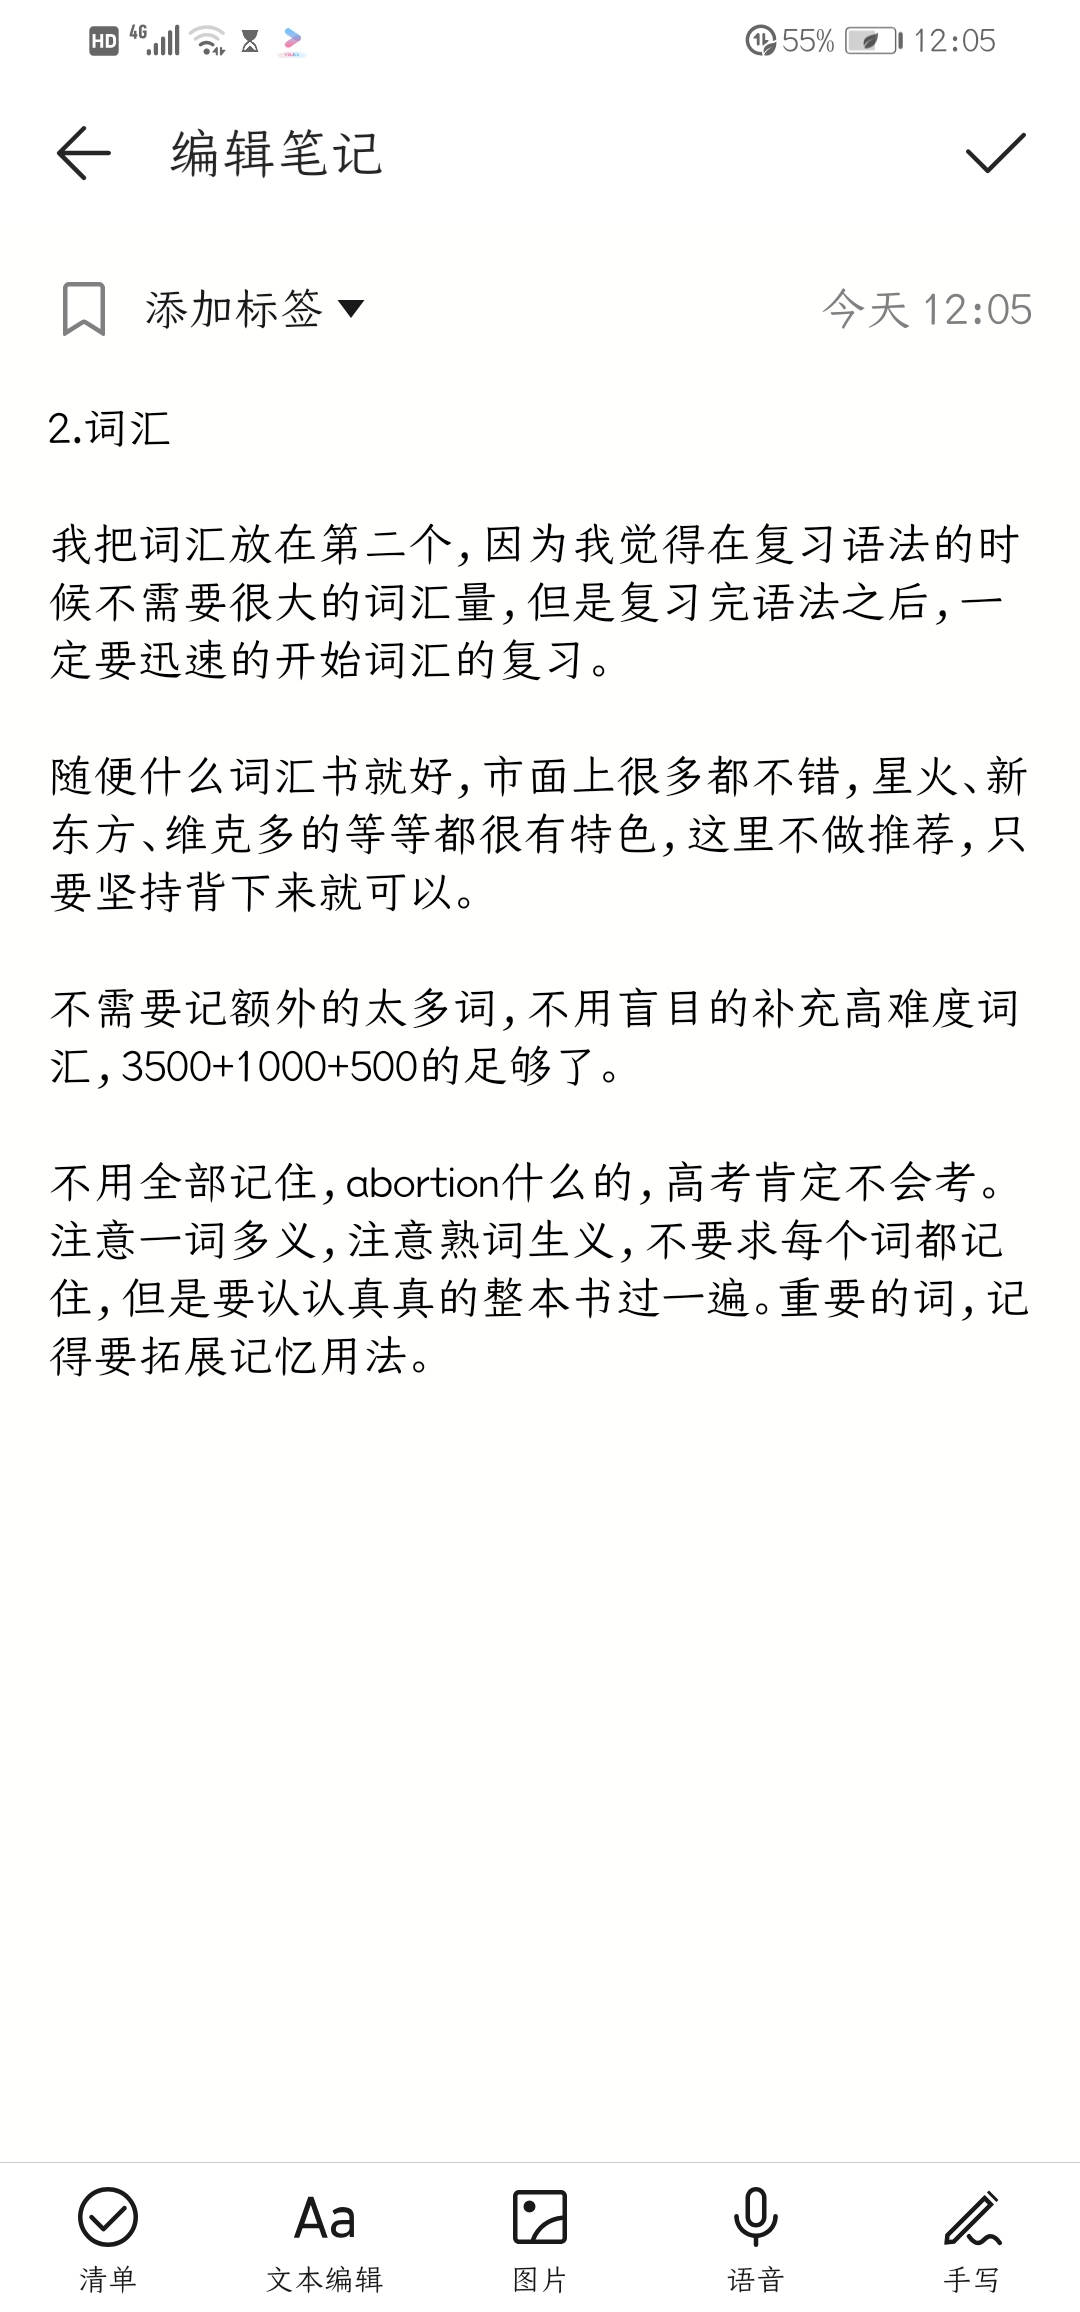 Screenshot_20190715_120556_com.example.android.notepad.jpg